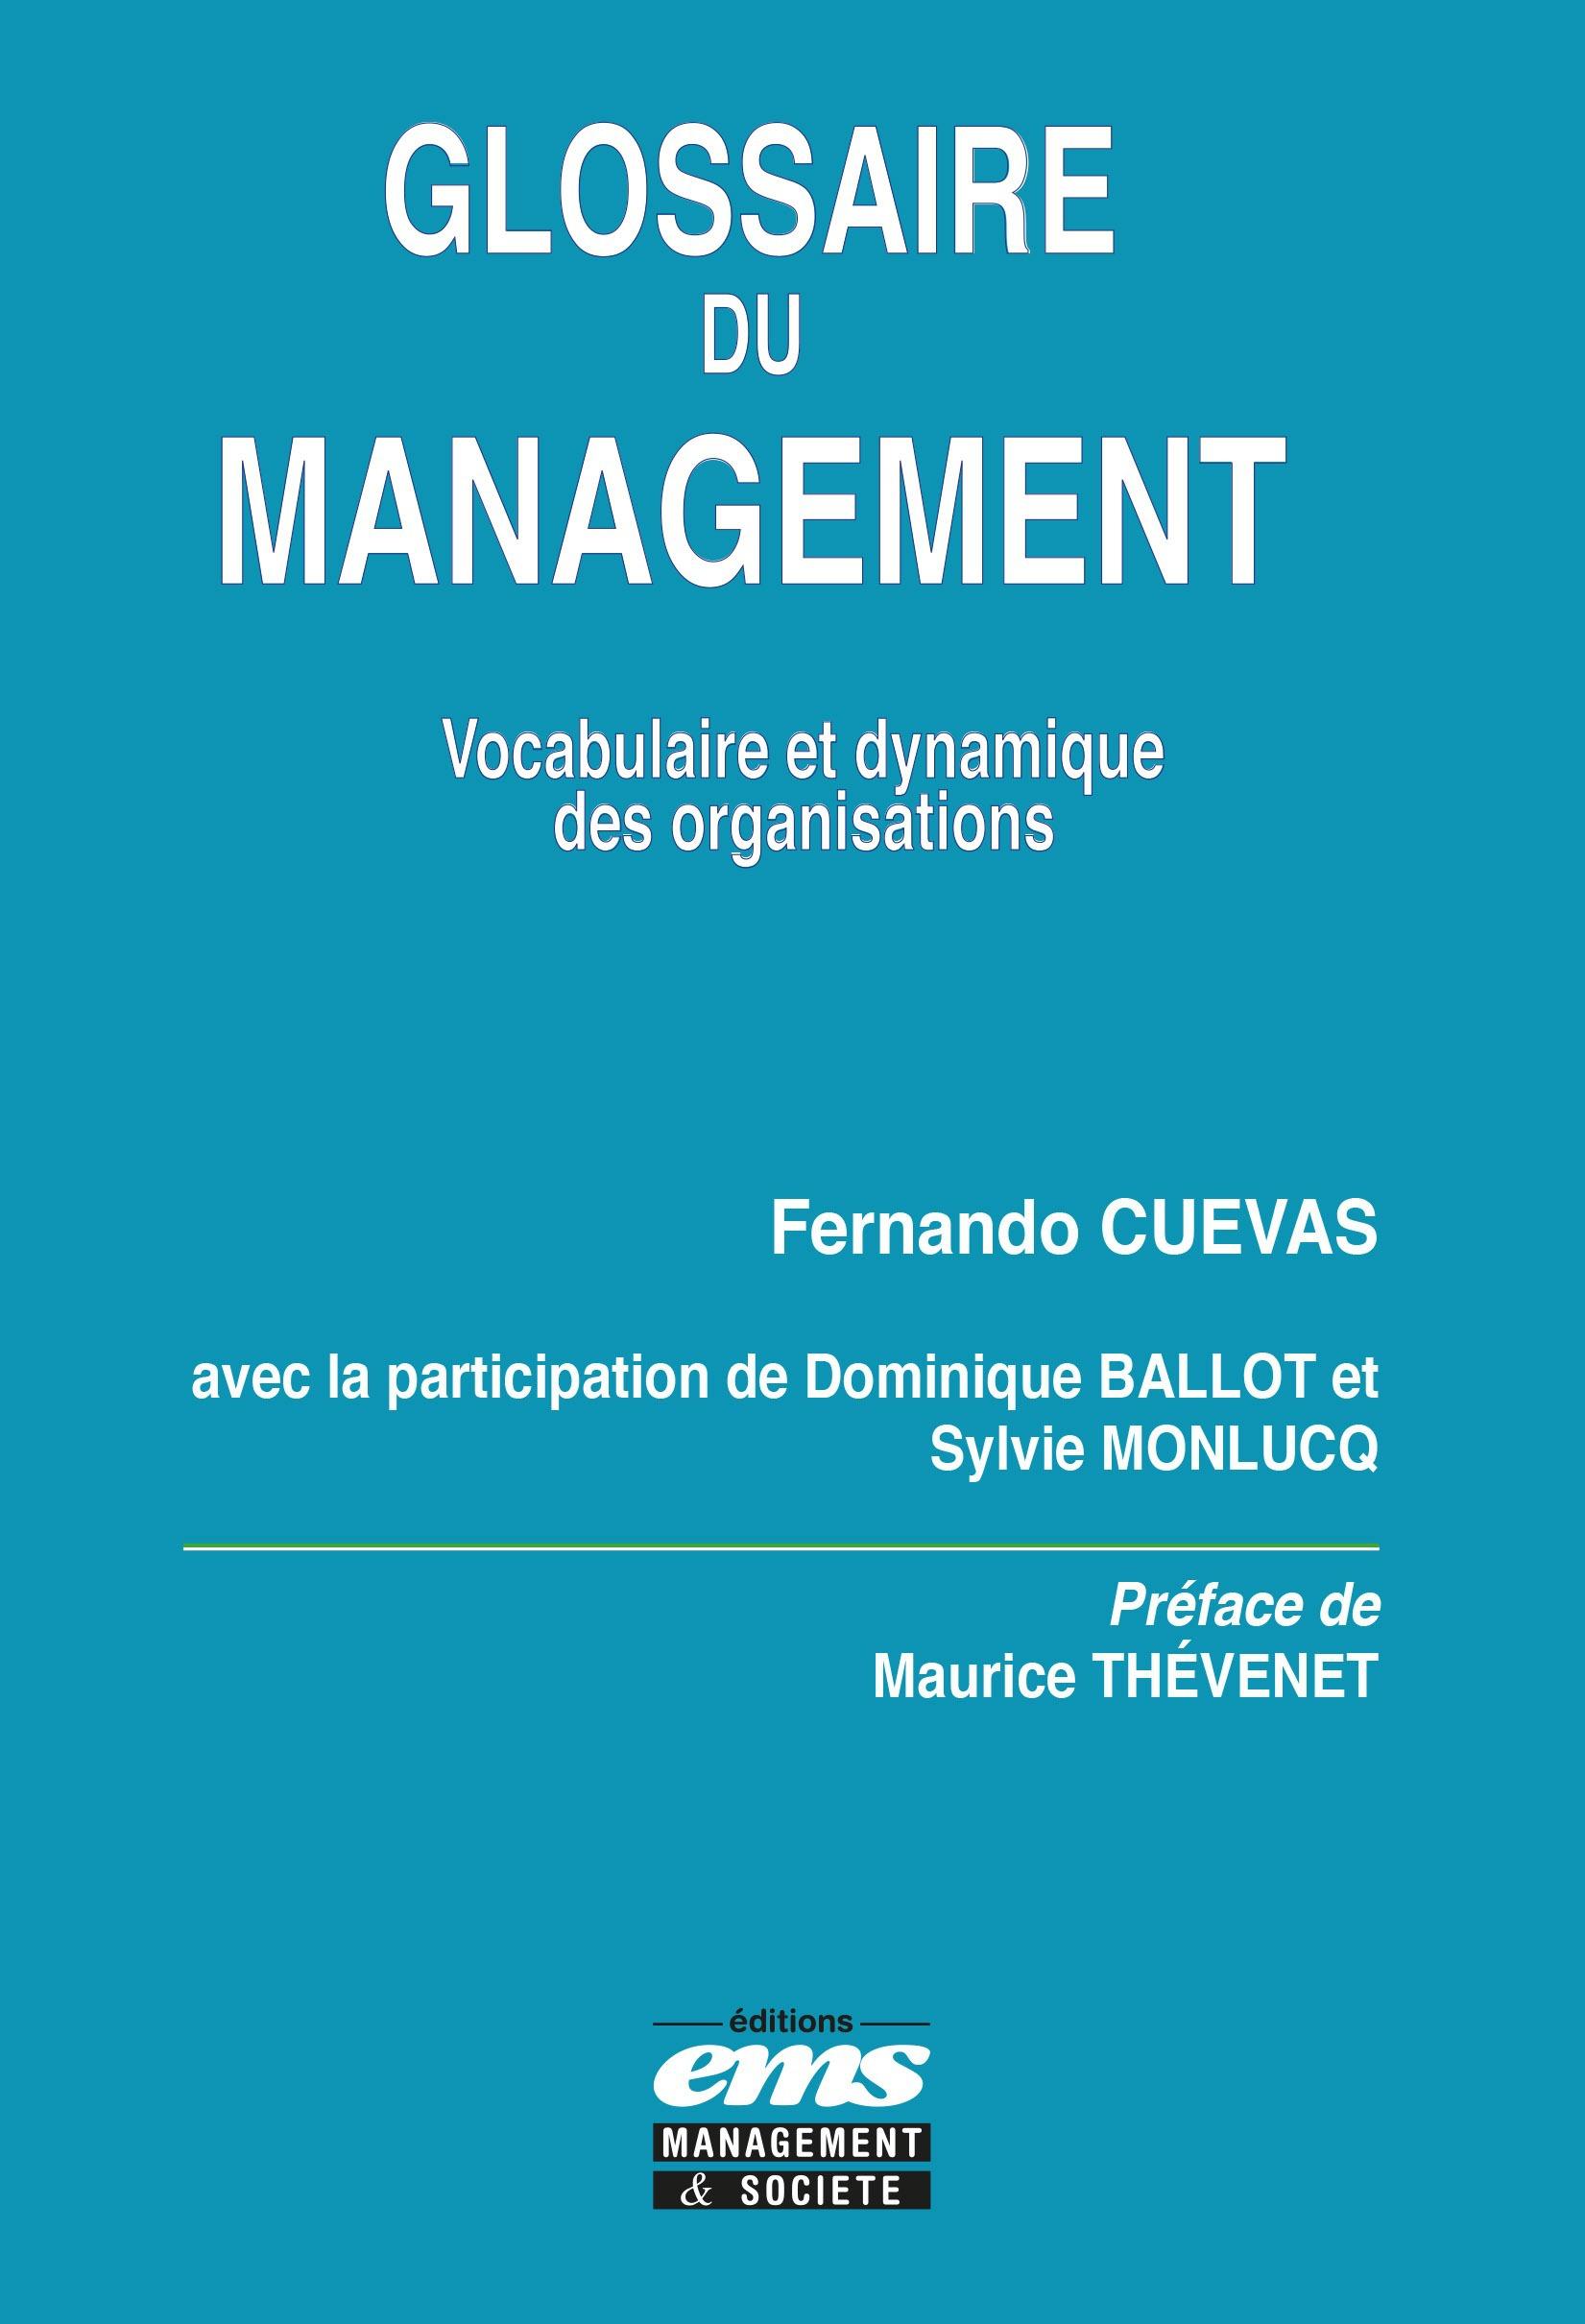 Fernando Cuevas Glossaire du management